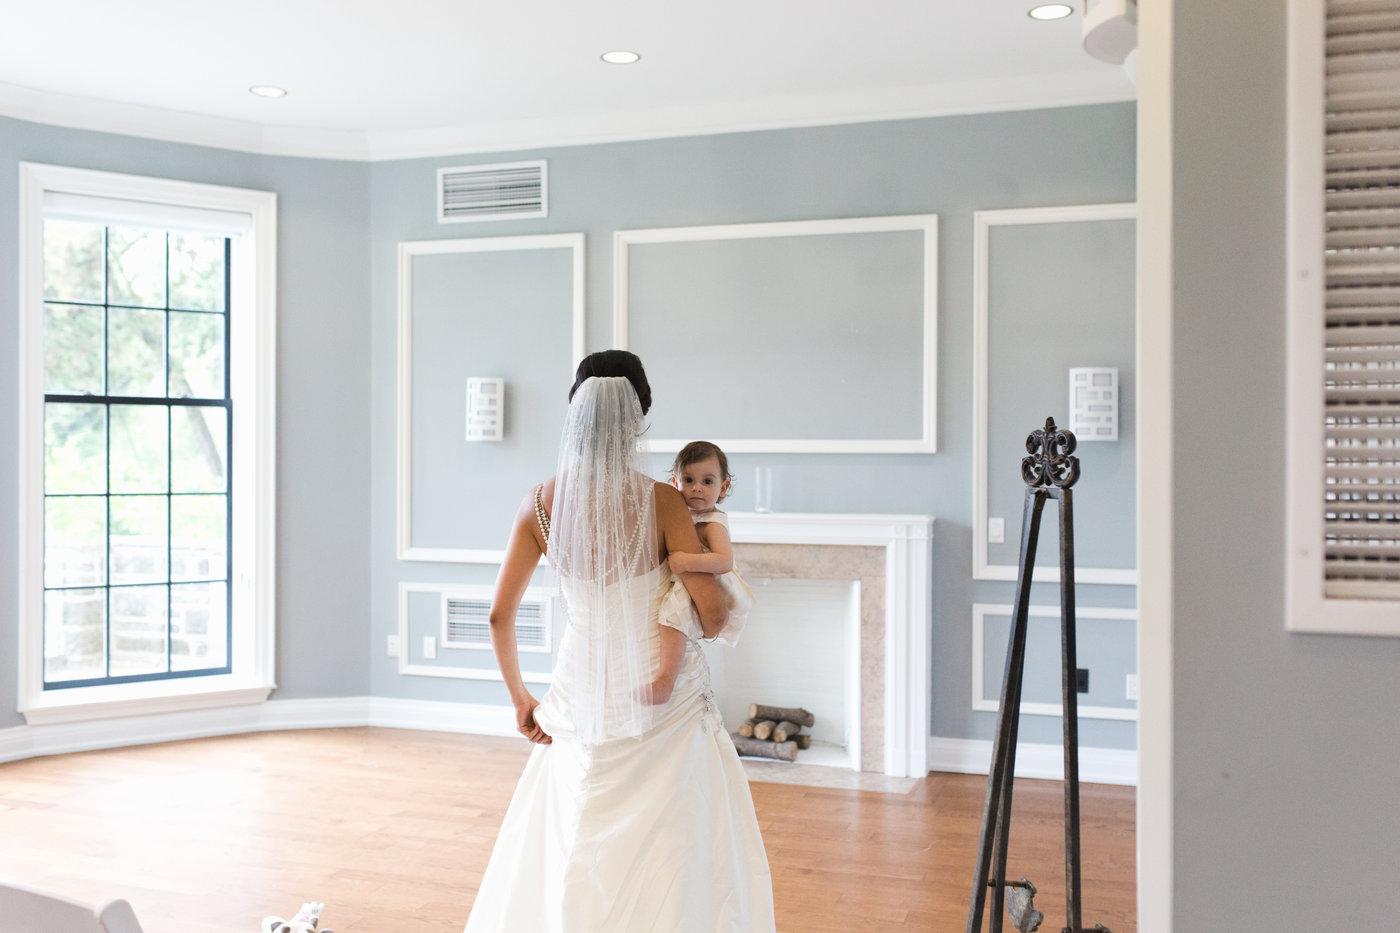 Jacquie Sean Wedding-Family Photos Bridal Party-0229.jpg